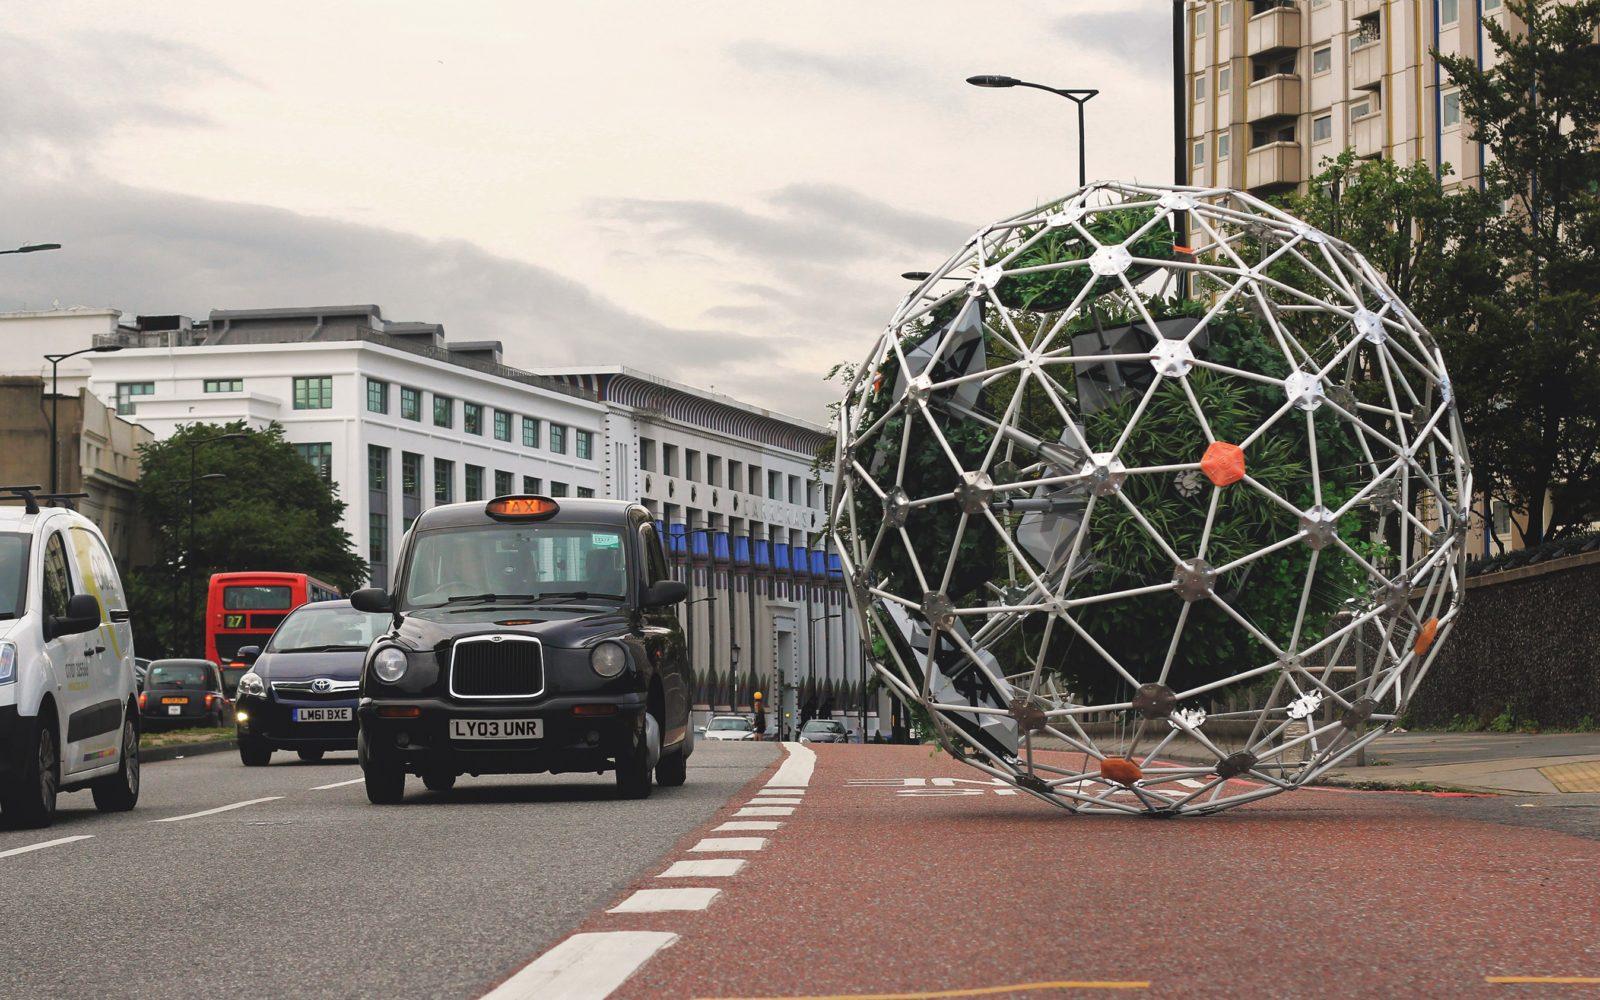 Hortum Machina, B – Speculative urban cyber-gardener